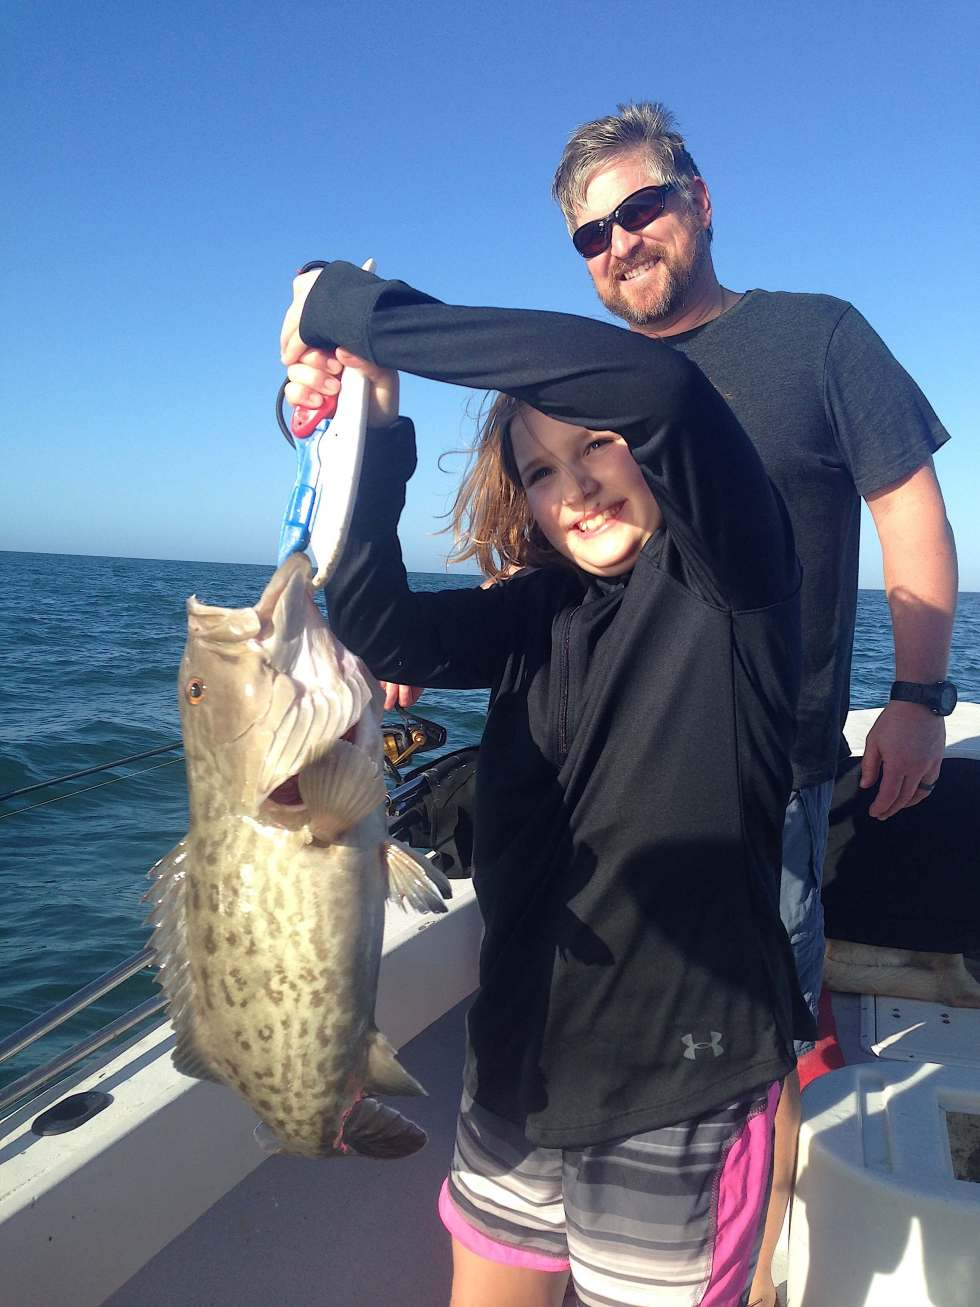 Grouper, Sanibel Fishing & Captiva Fishing, Sanibel Island, Tuesday December 27, 2016.